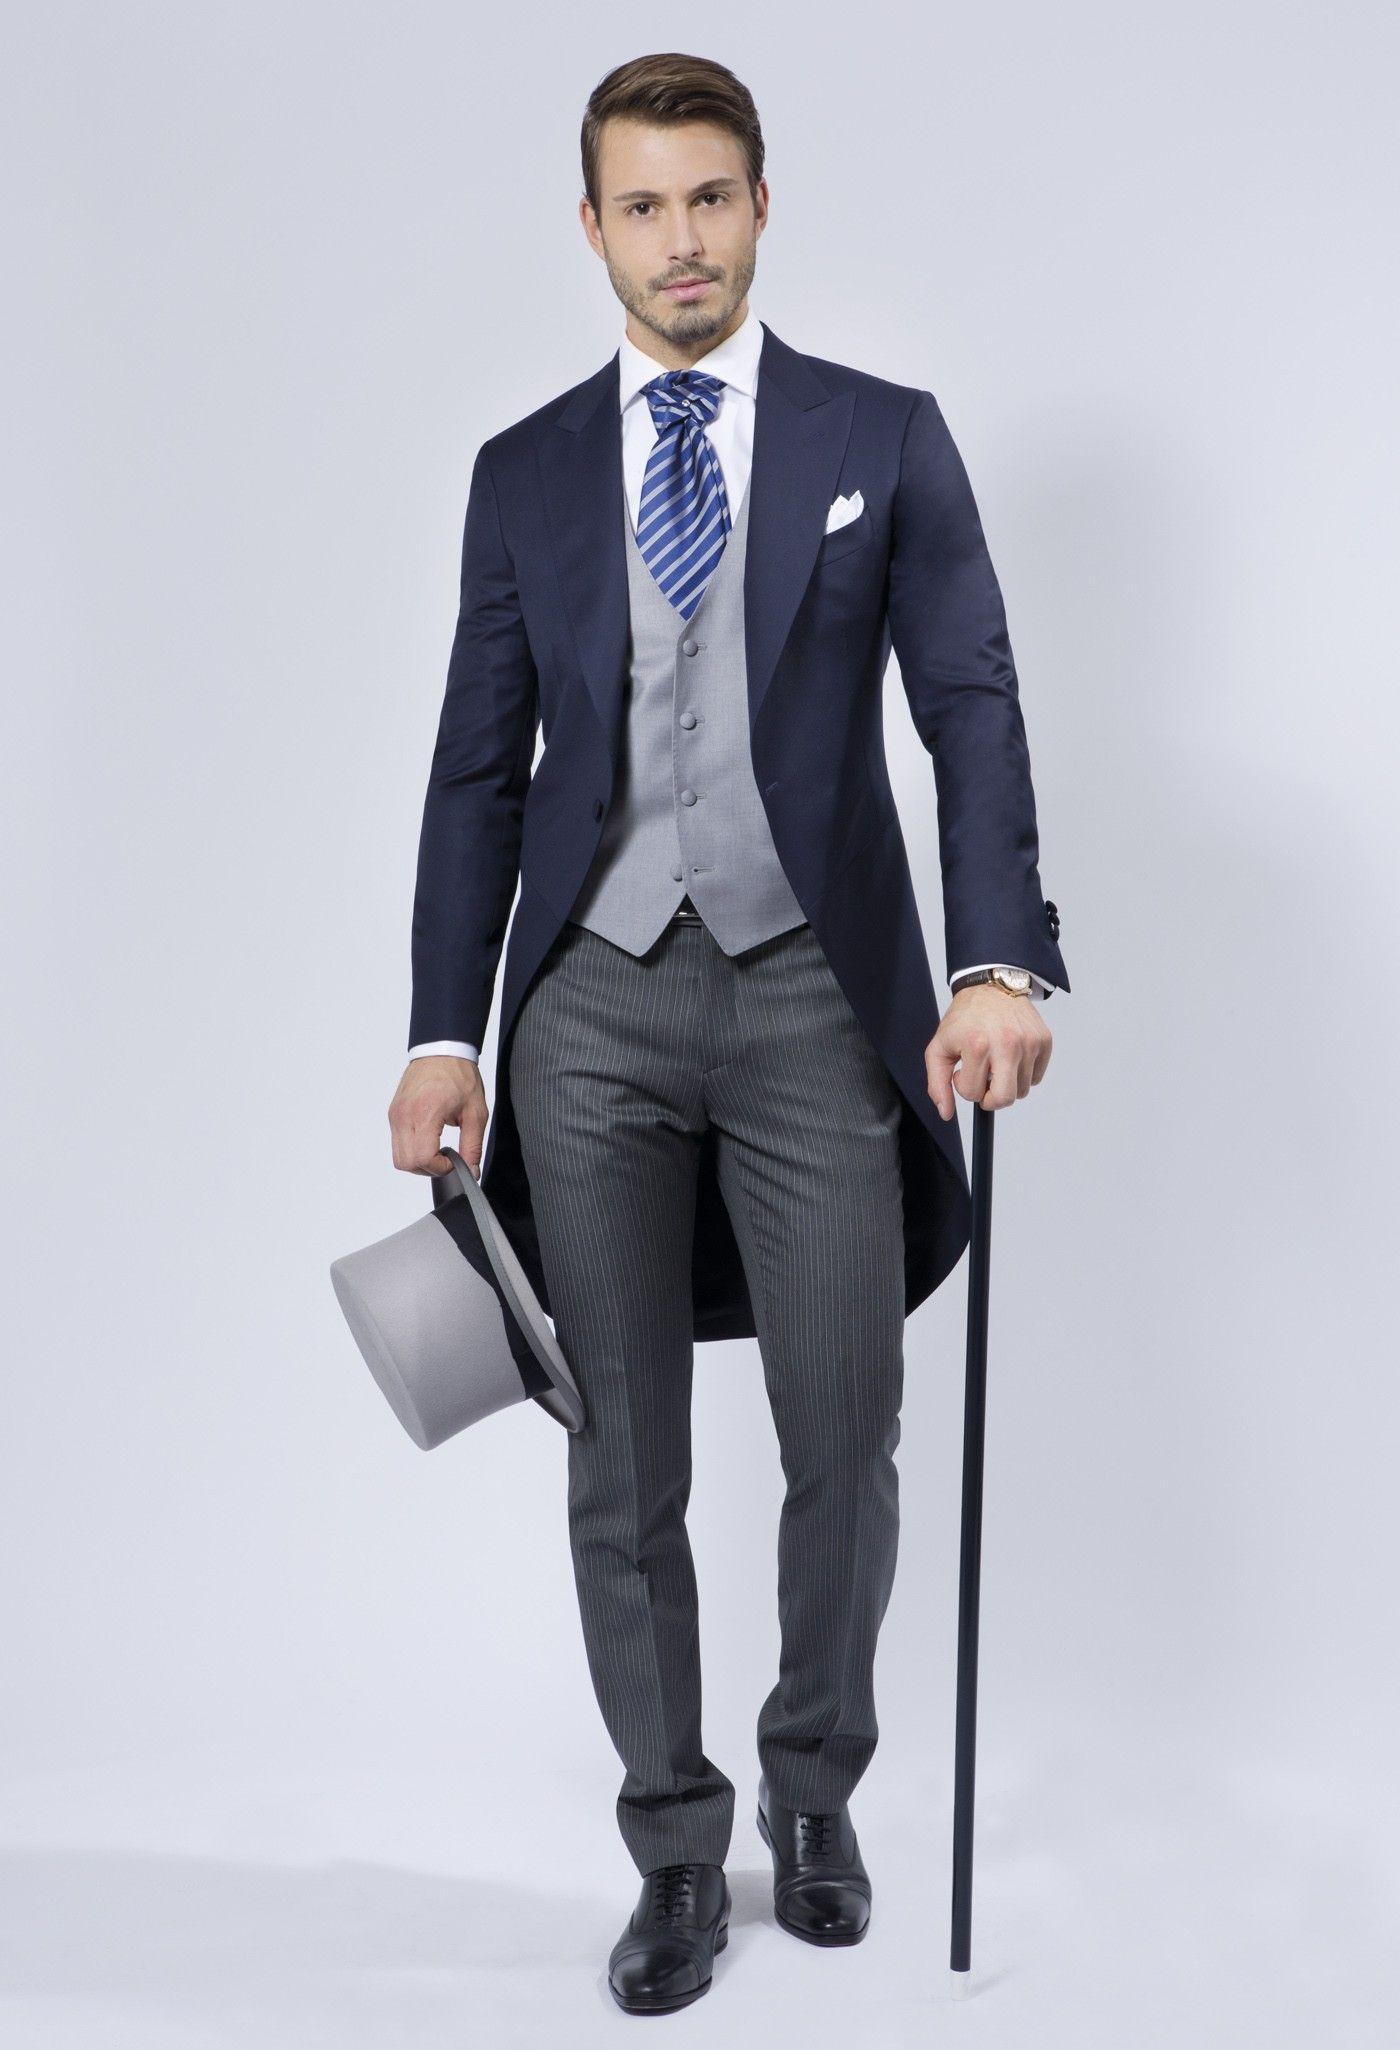 Novio Azul Marino · Clásico y elegante... Ropa Para Boda Hombre 9b72e36b868